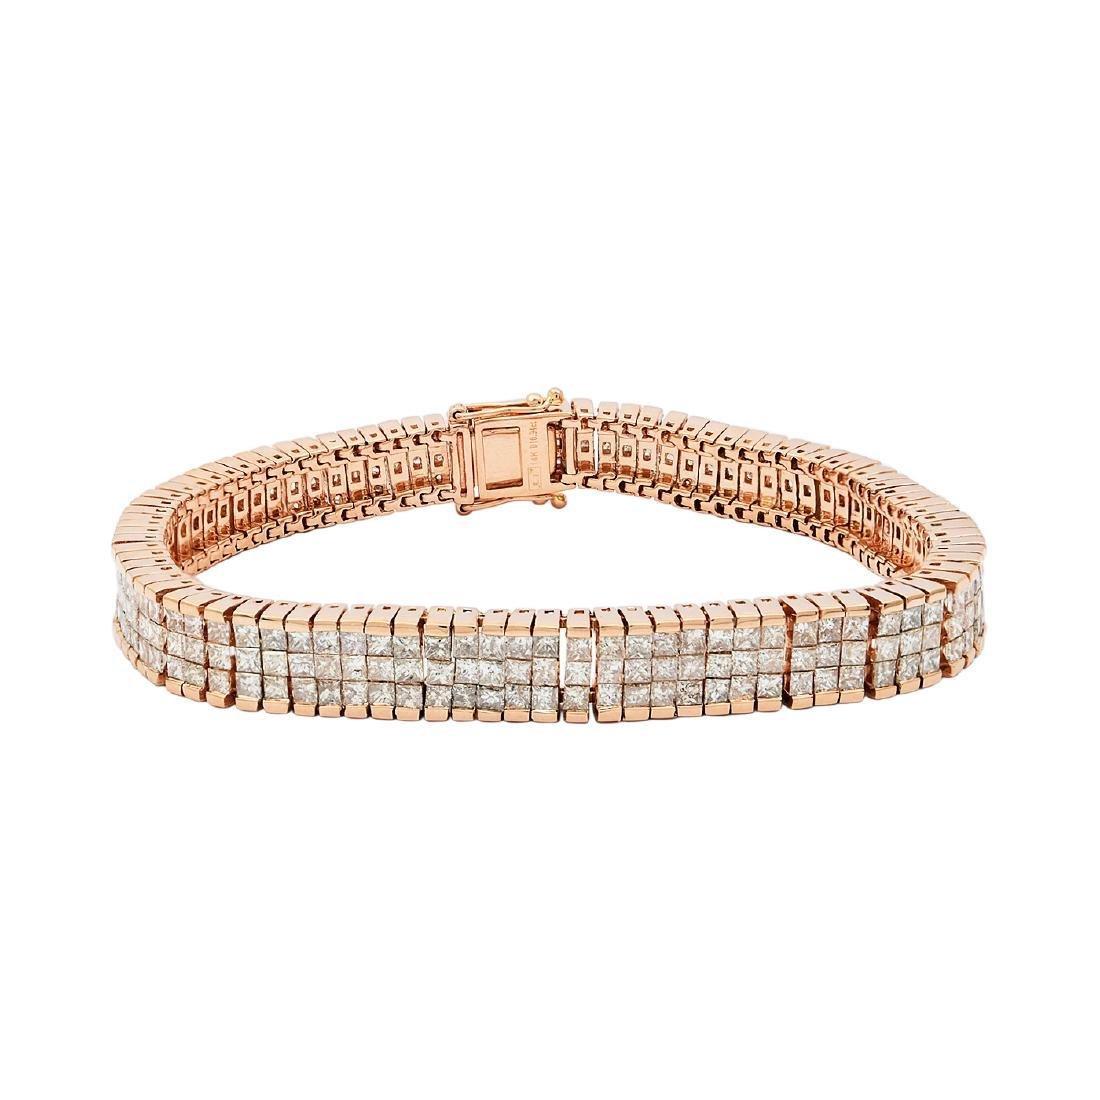 14K Rose Gold Diamond Tennis Bracelet, 10.94ctw